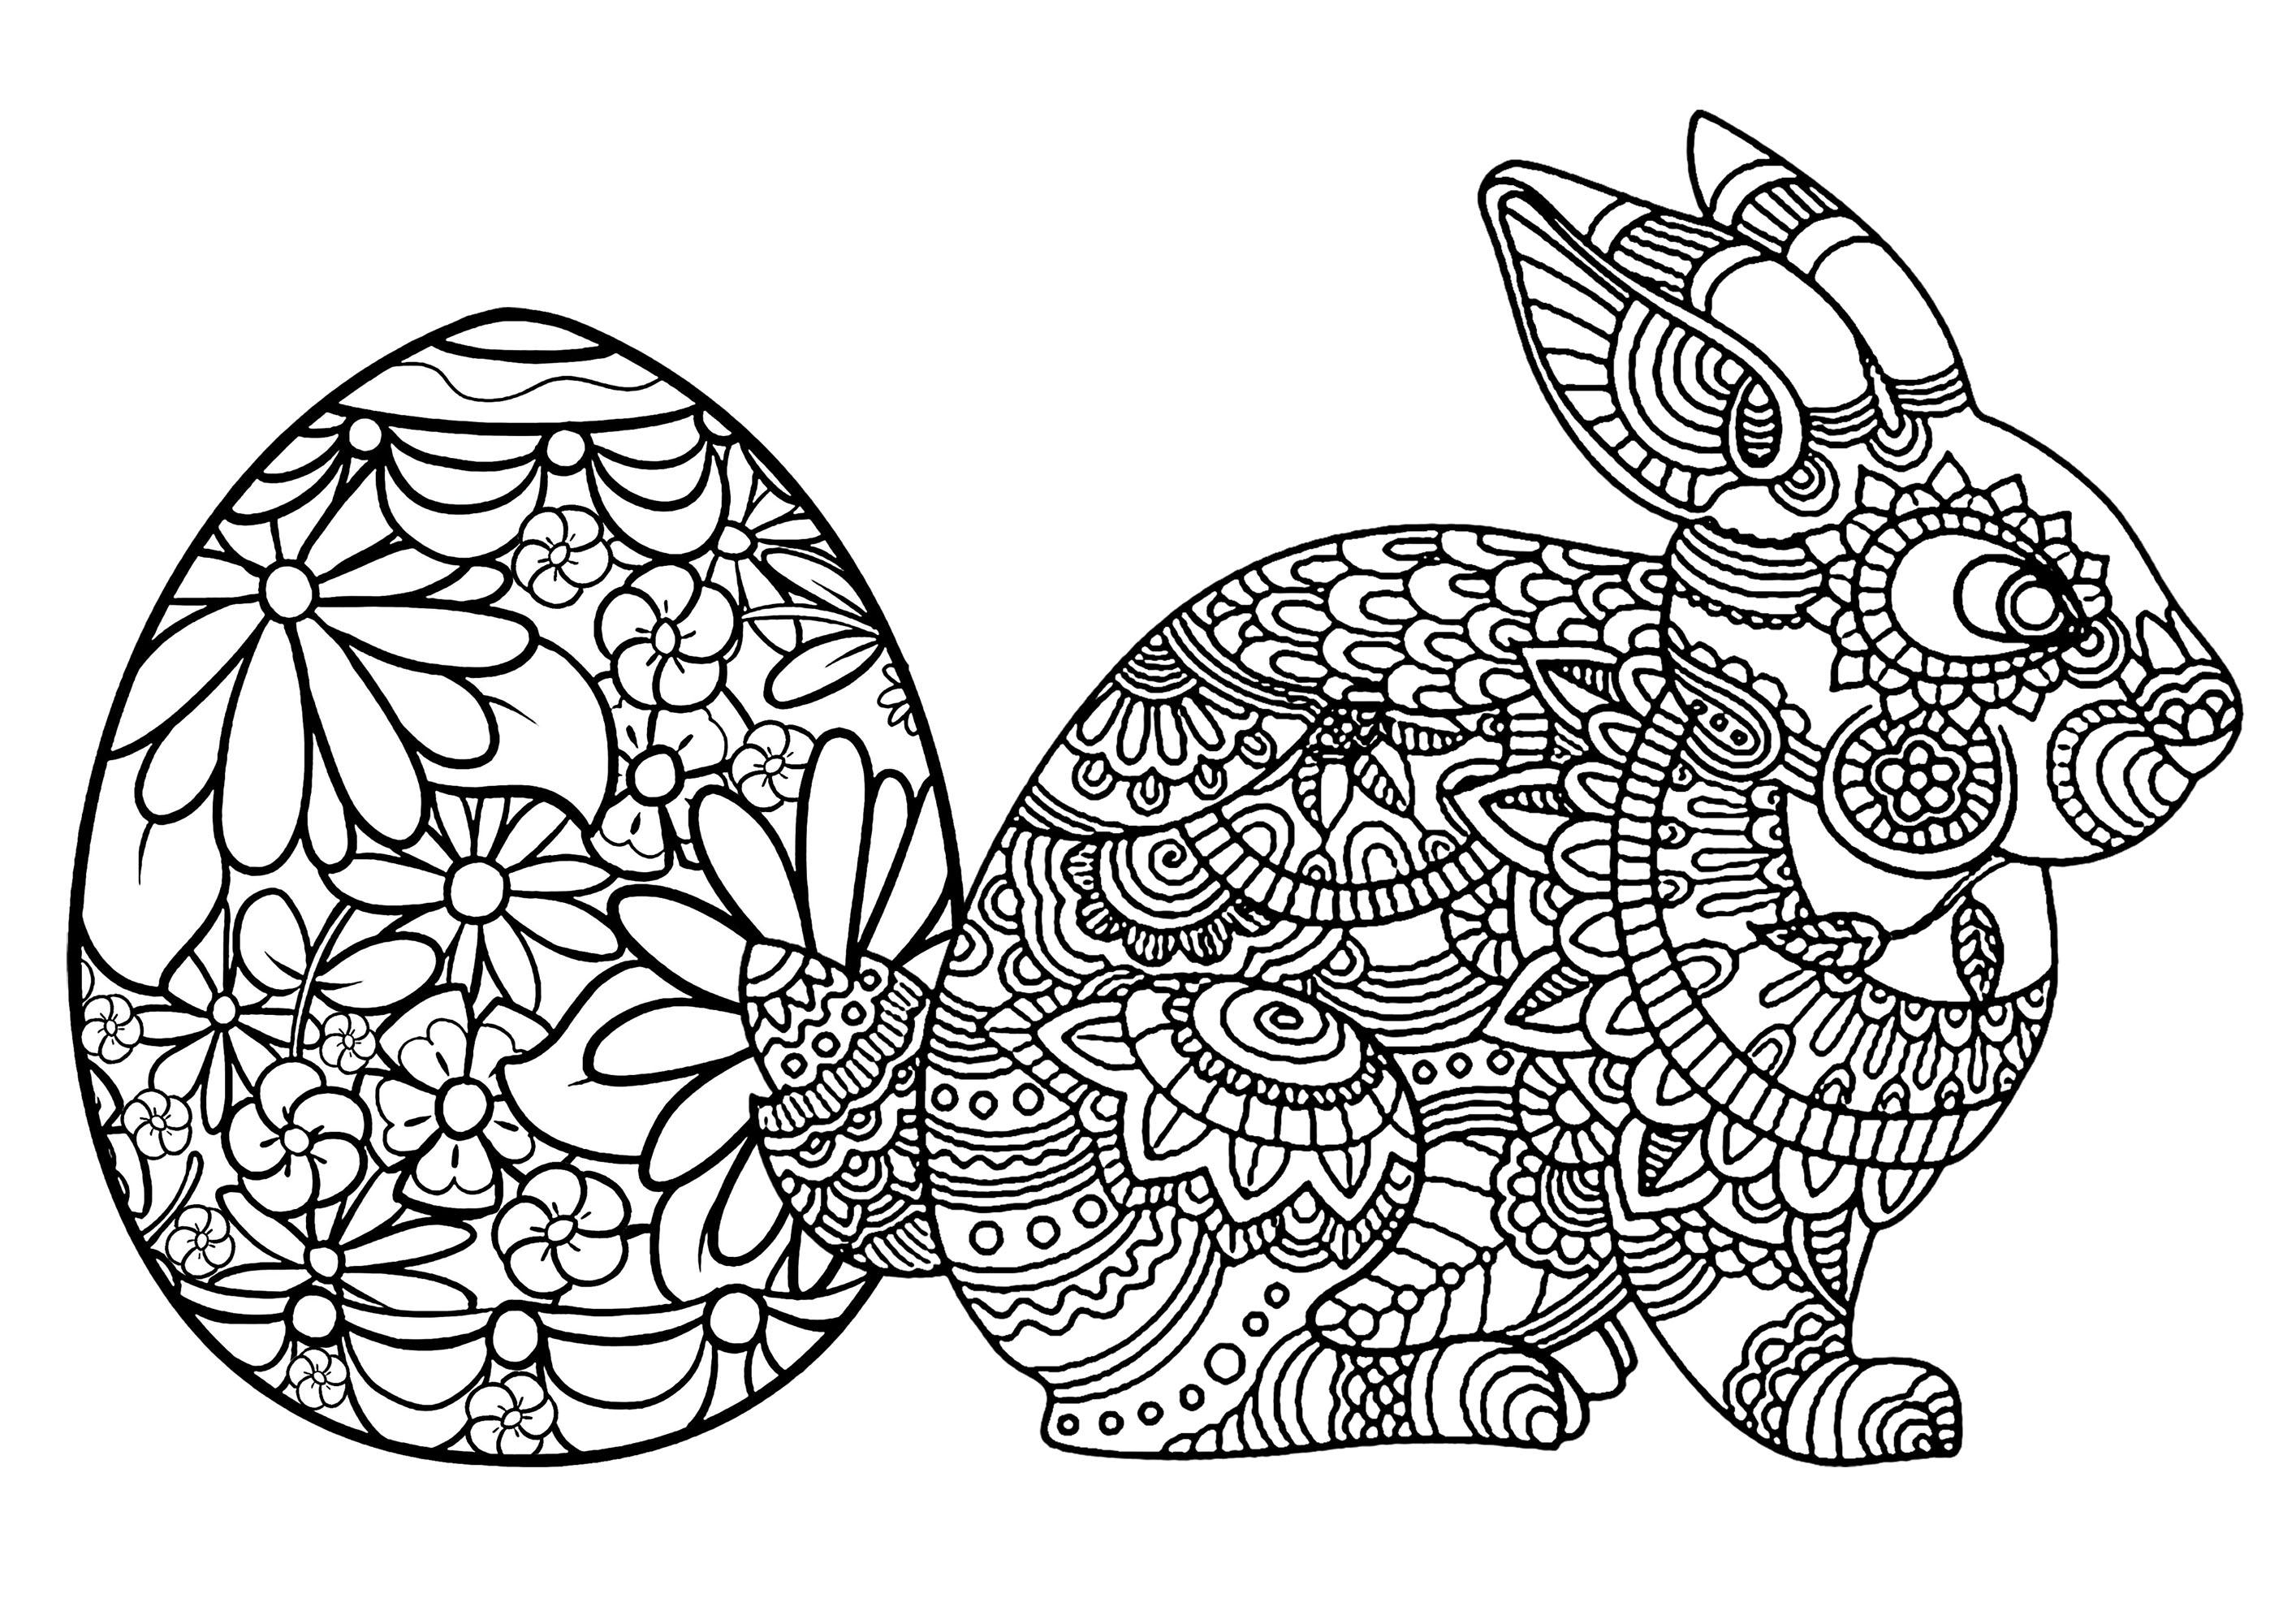 Coloriage Mandala Oeuf De Paques.Oeuf Et Lapin De Paques Paques Coloriages Difficiles Pour Adultes